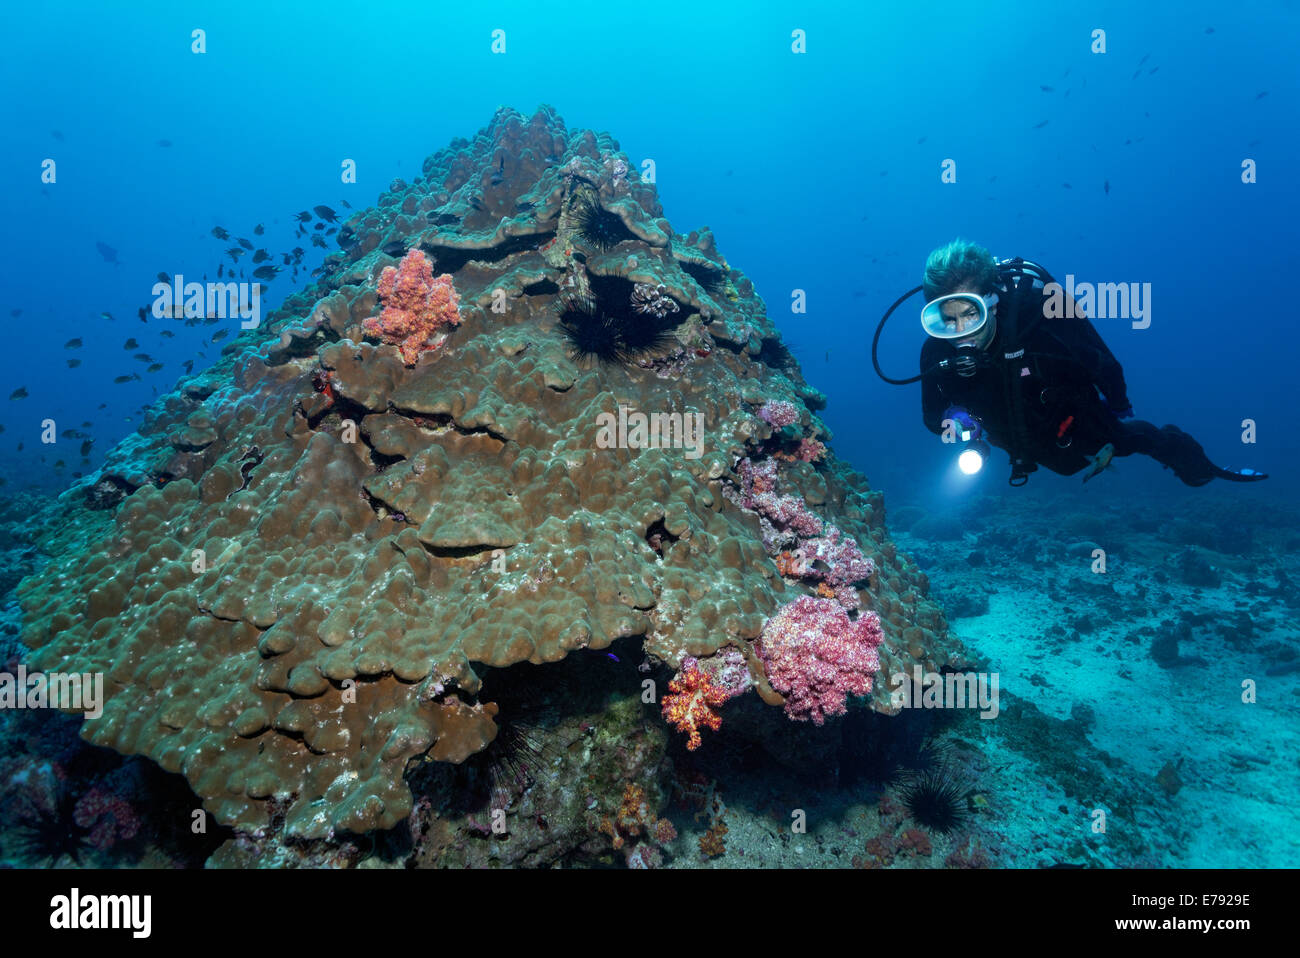 Soft corals growing on stony corals, a diver at the back, Dimaniyat Islands nature reserve, Al Batinah region, Oman - Stock Image